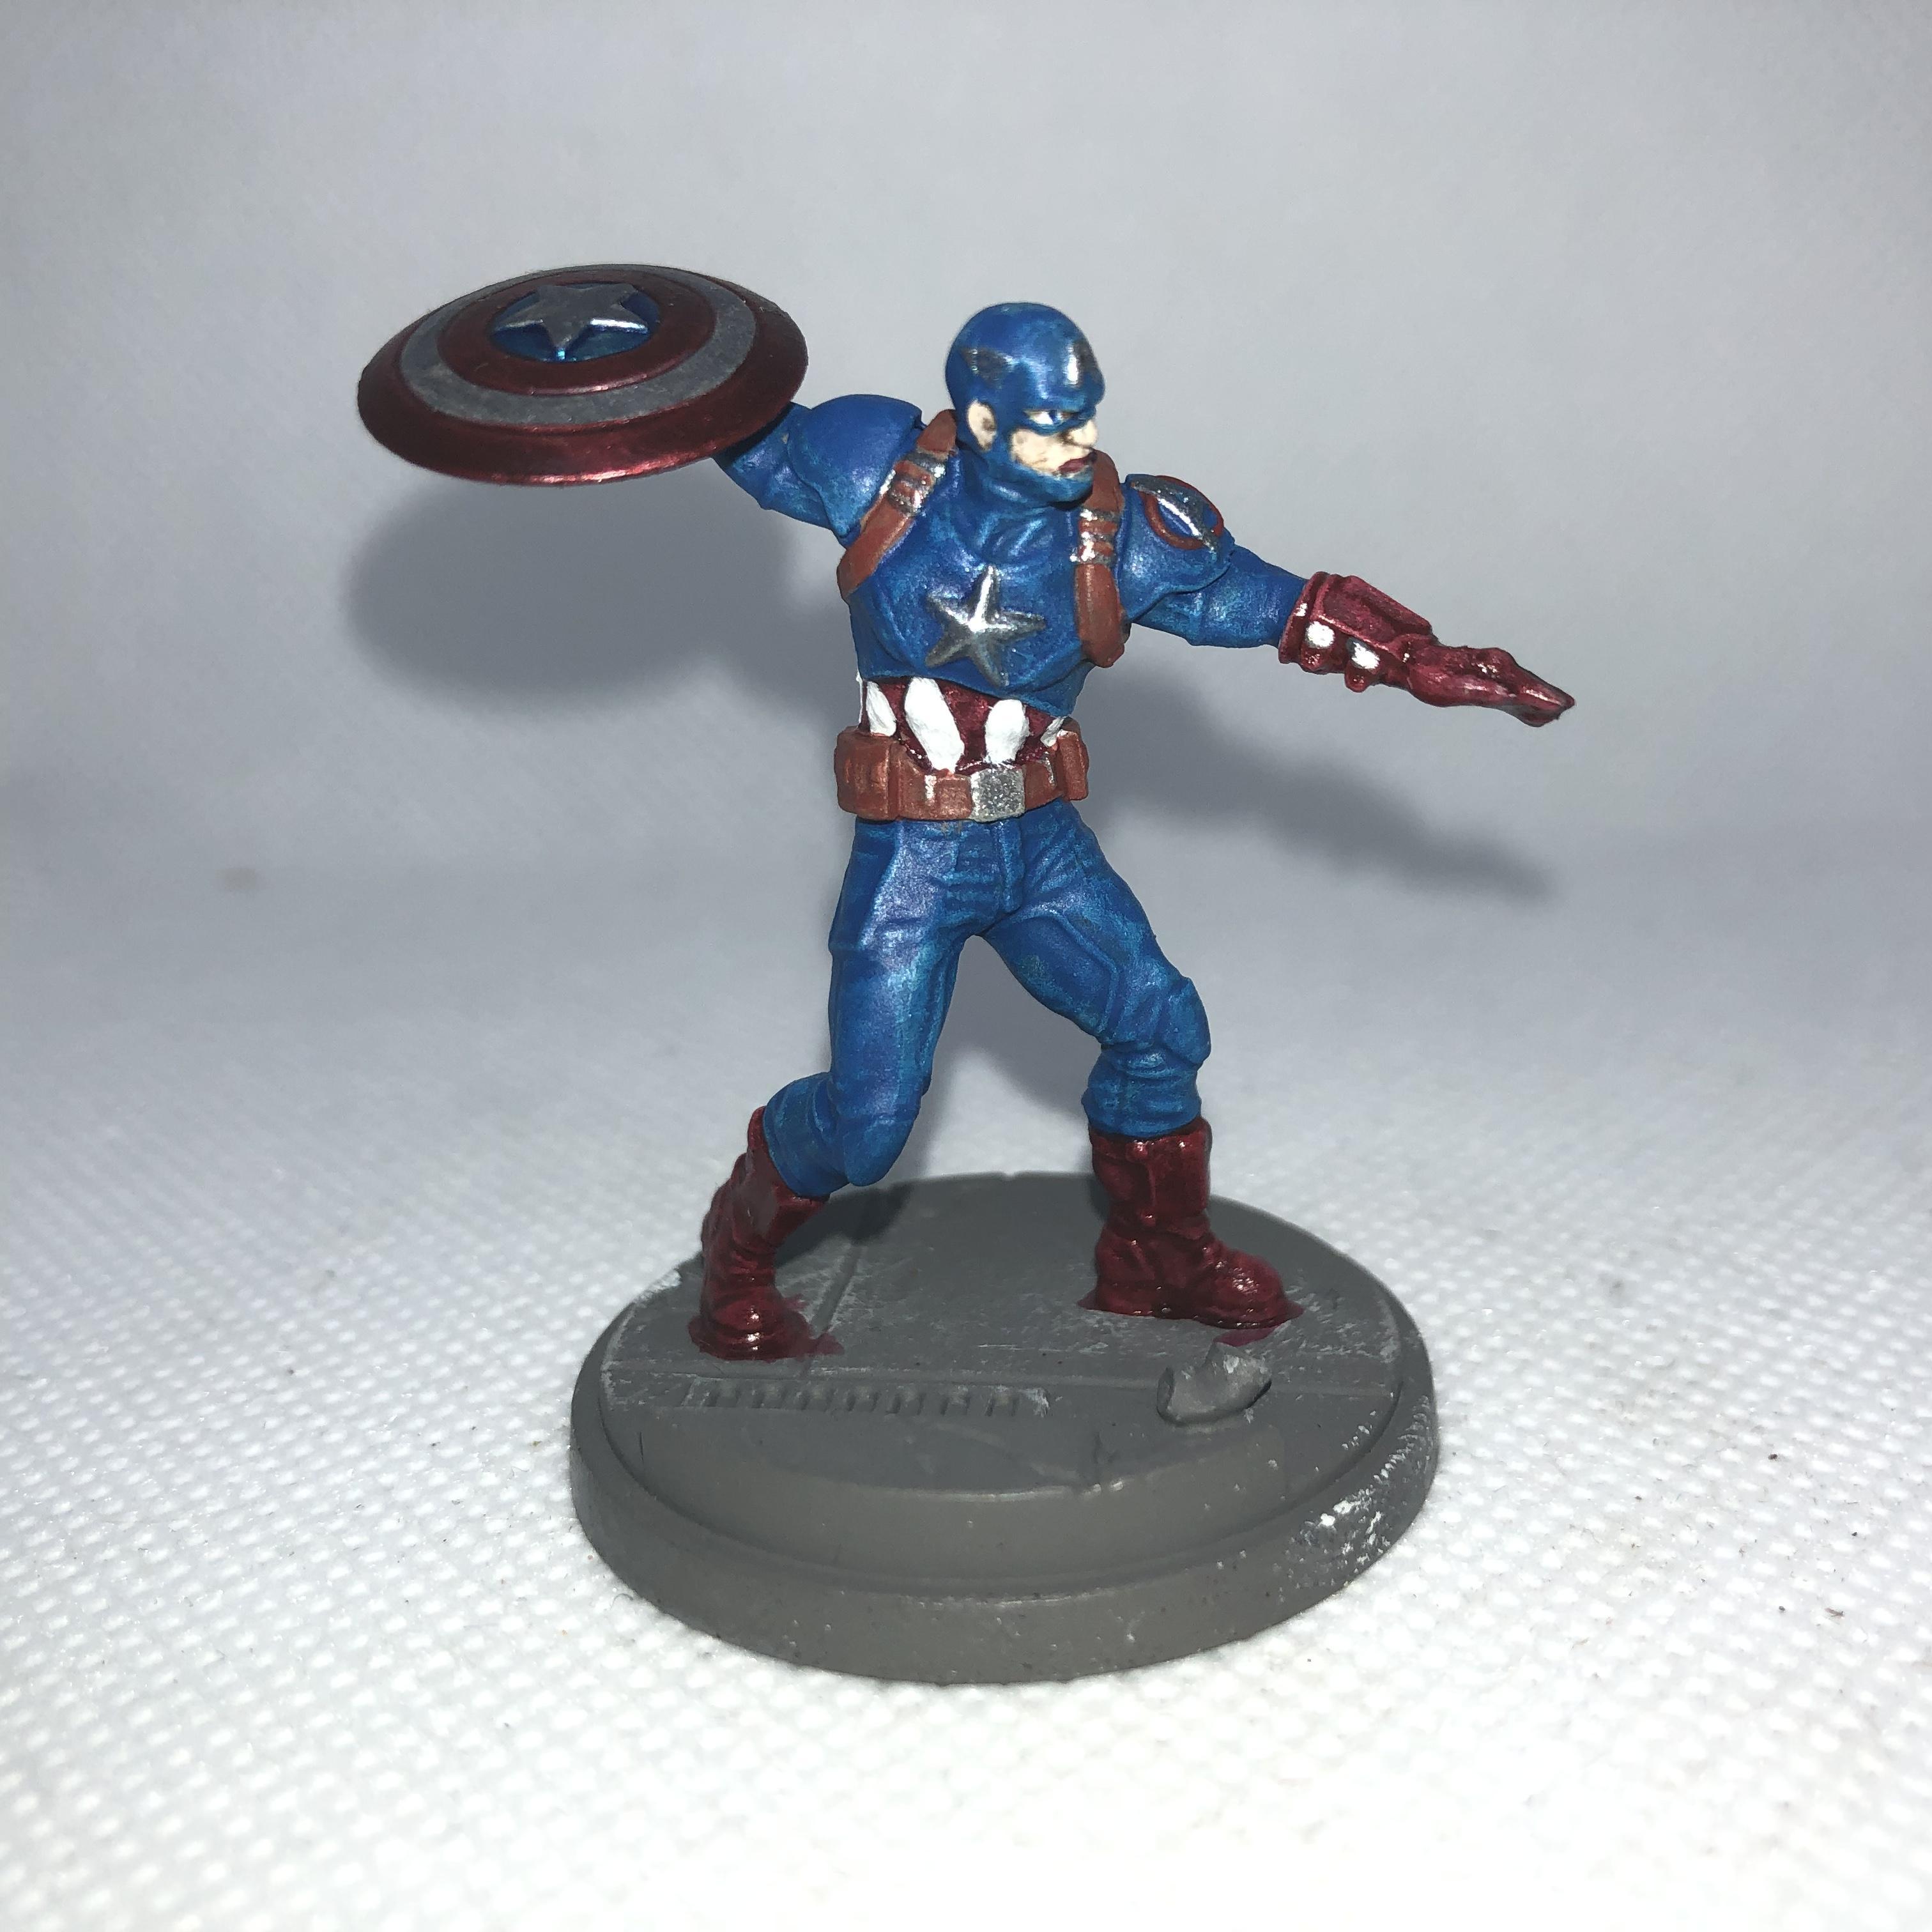 Captain America, Crisis Protocol, Marvel, Superhero, Work In Progress